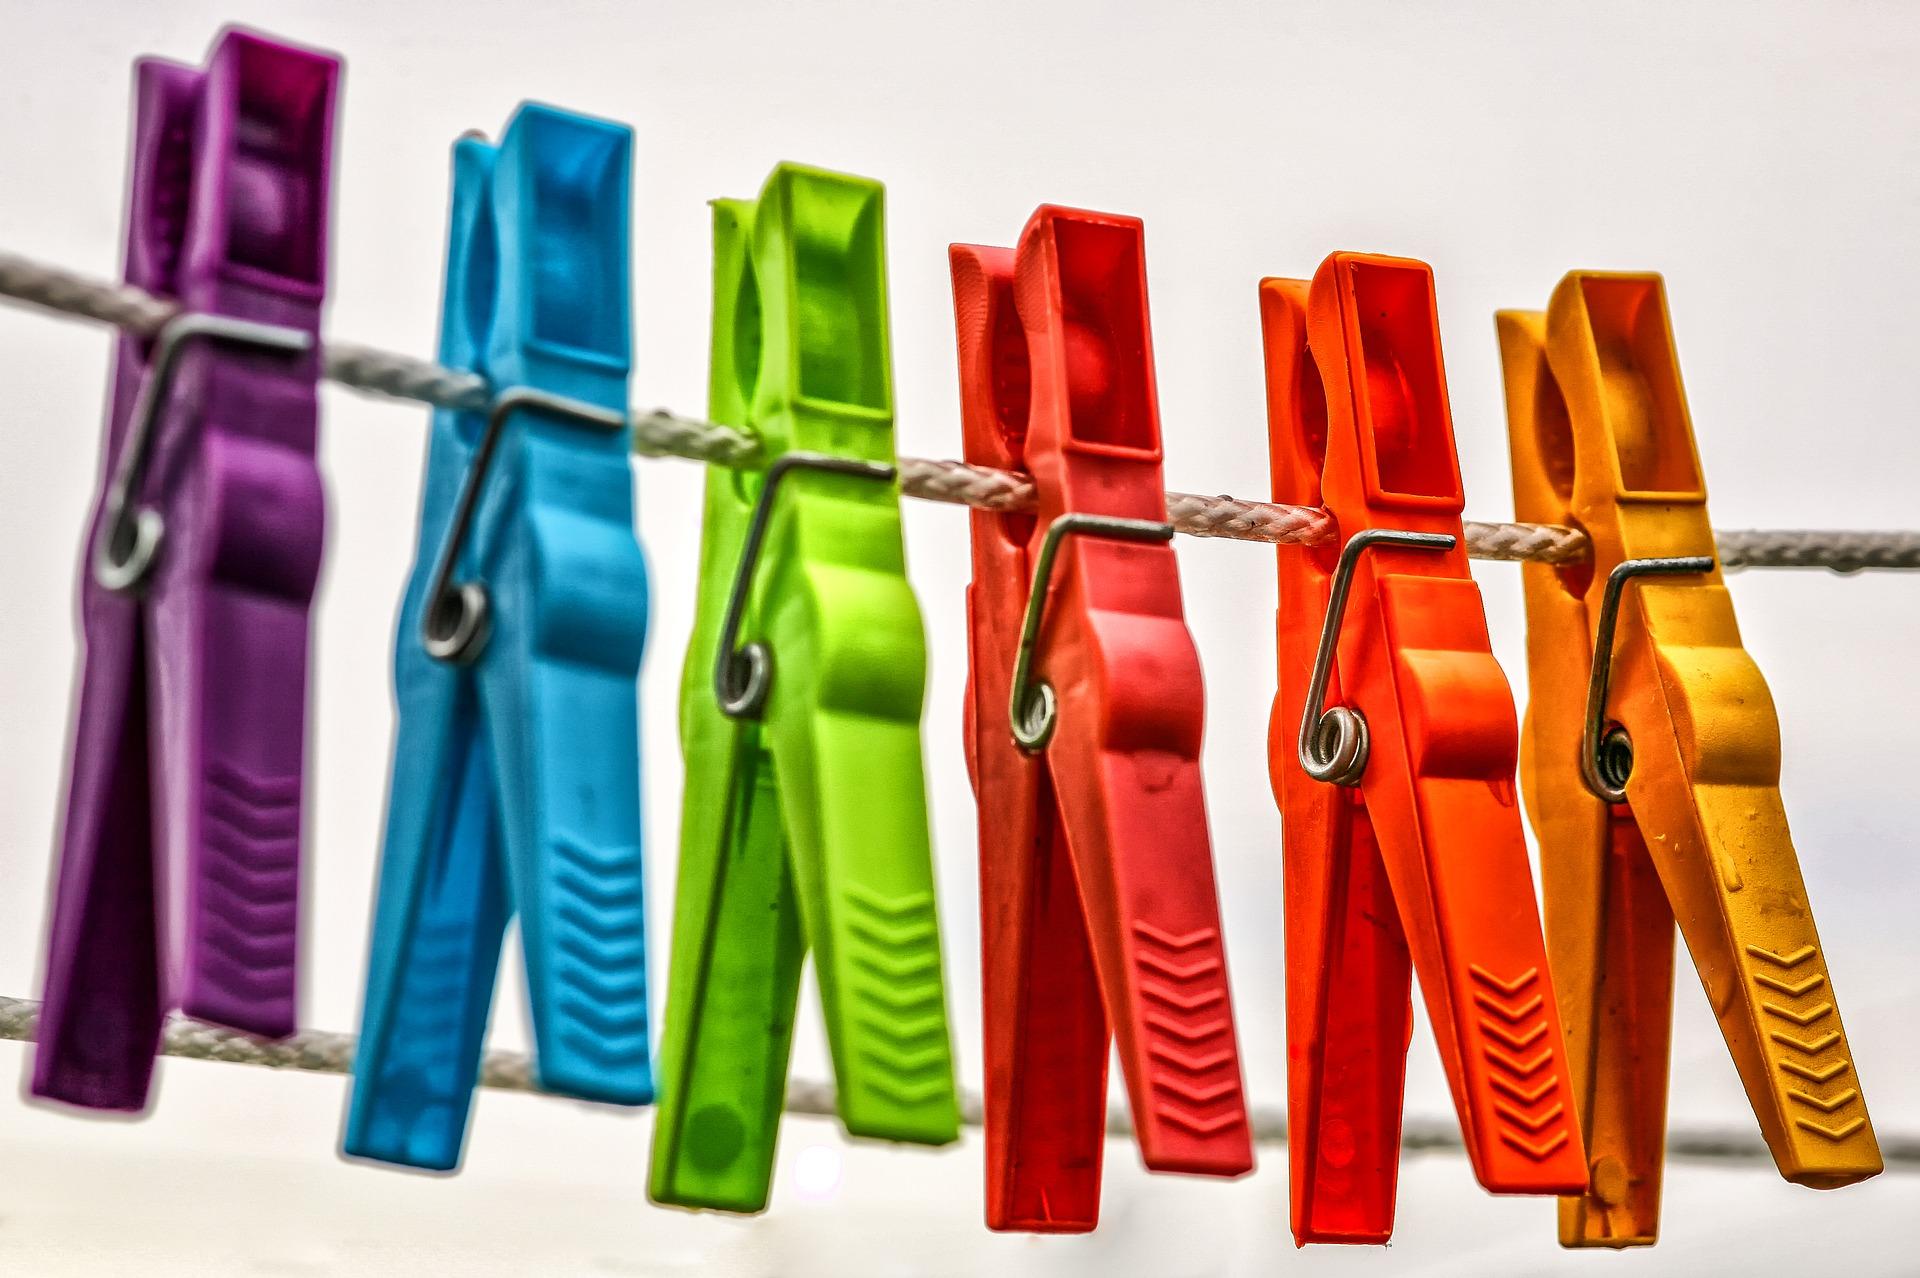 clothespins-3687611_1920.jpg